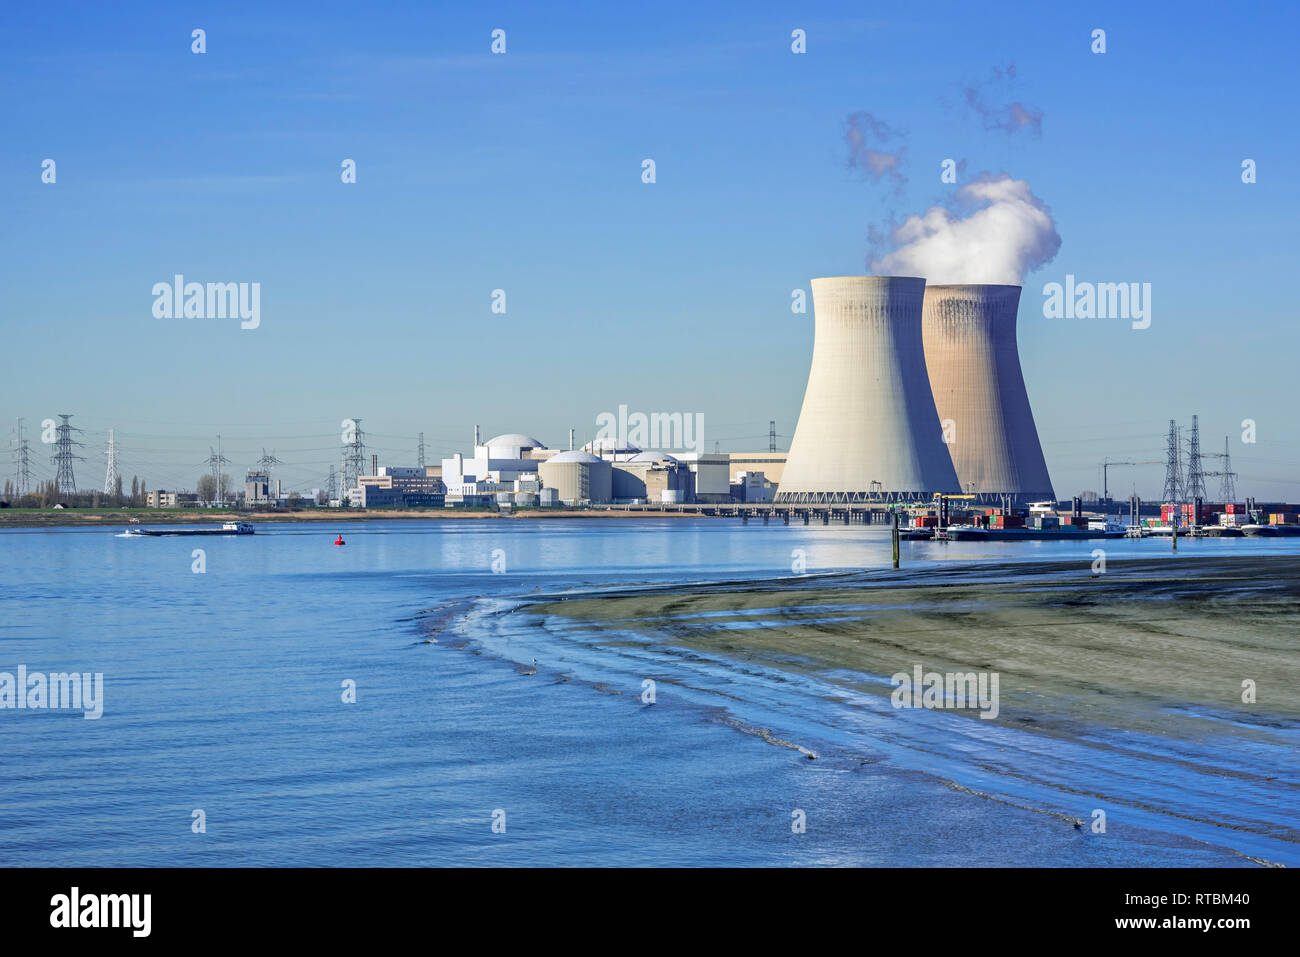 Doel Nuclear Power Station / nuclear power plant in the Antwerp harbour along the river Scheldt / Schelde, Flanders, Belgium - Stock Image